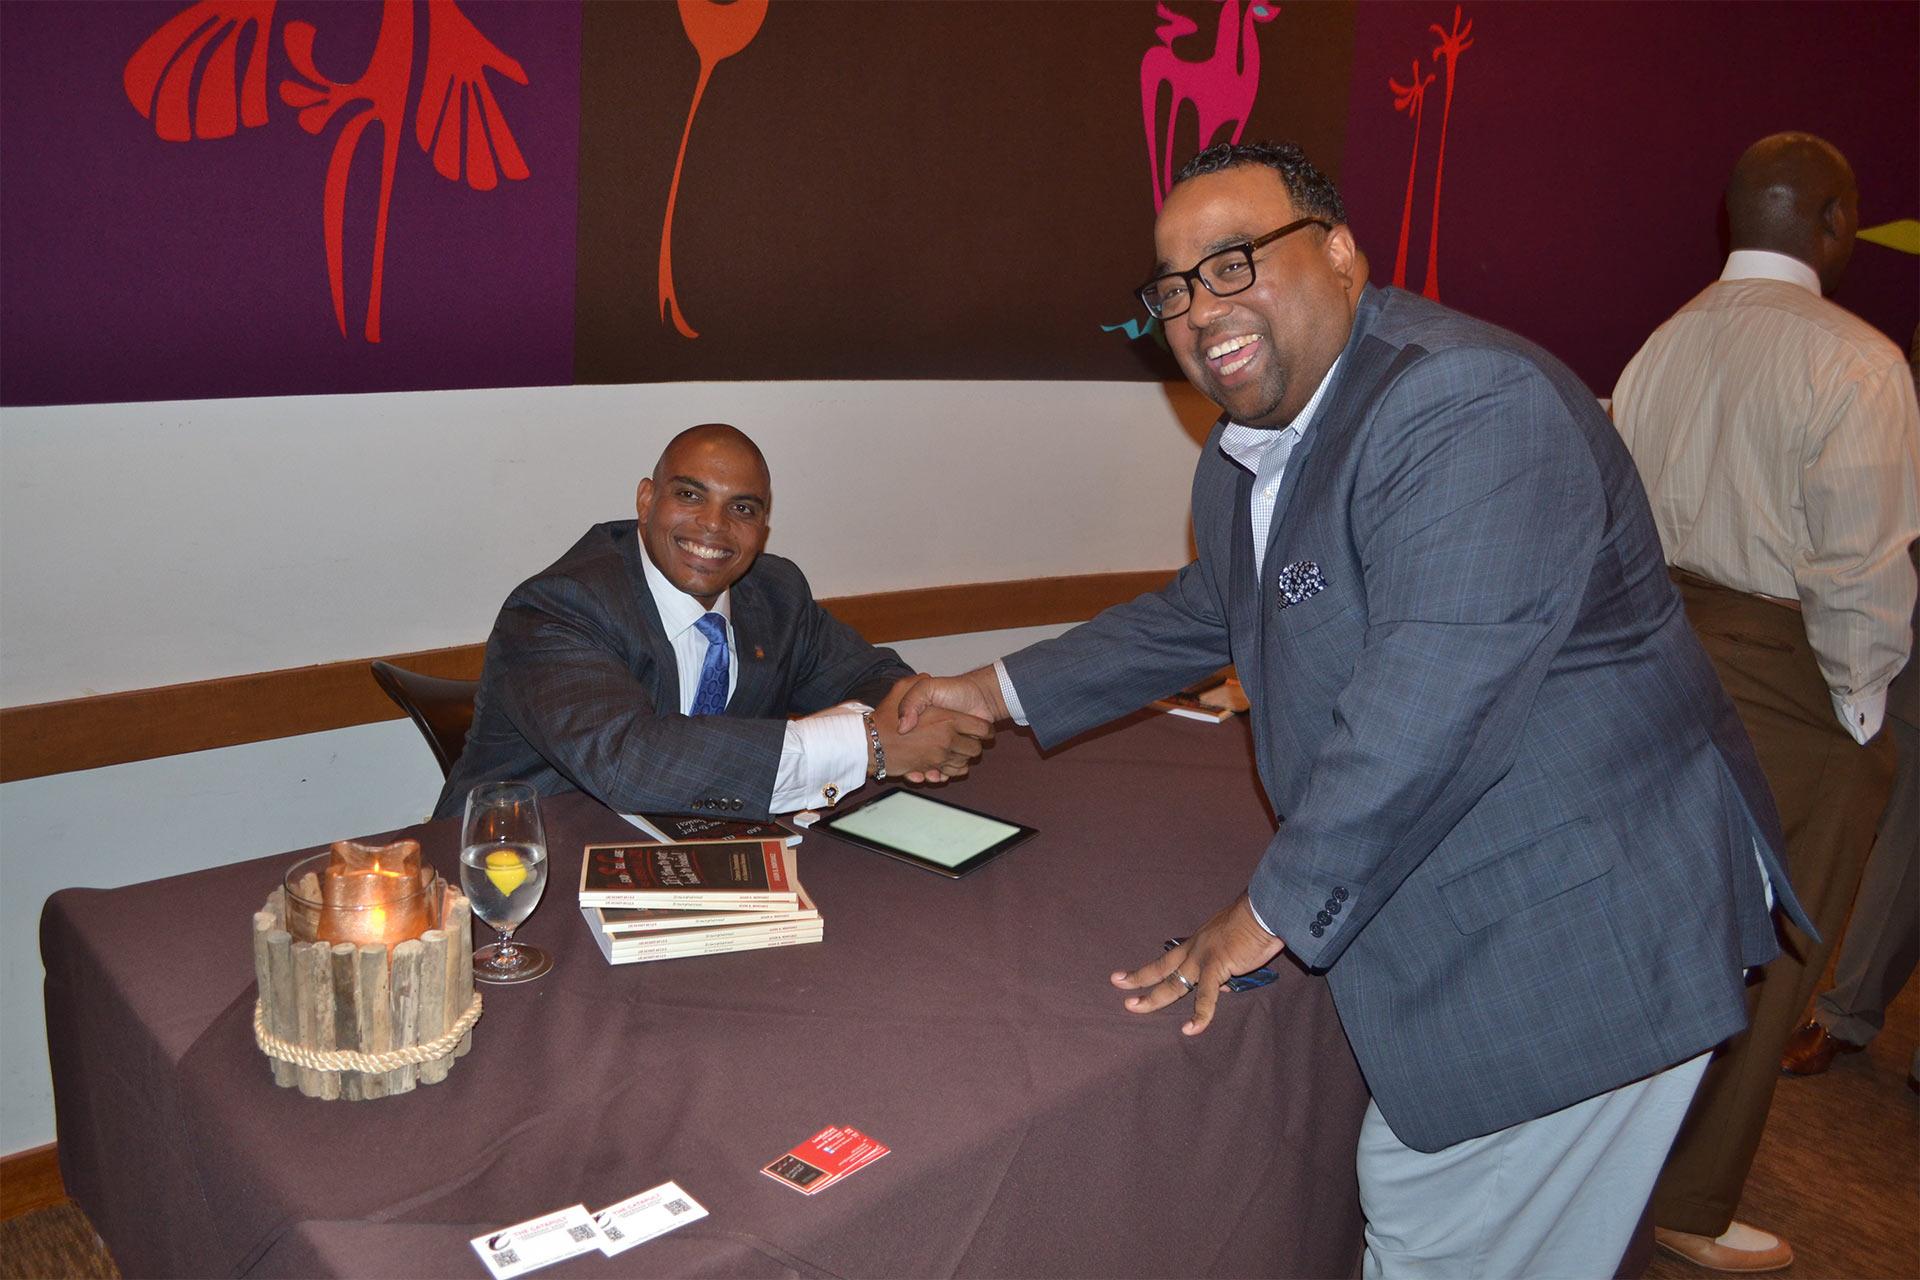 Jason Book Signing